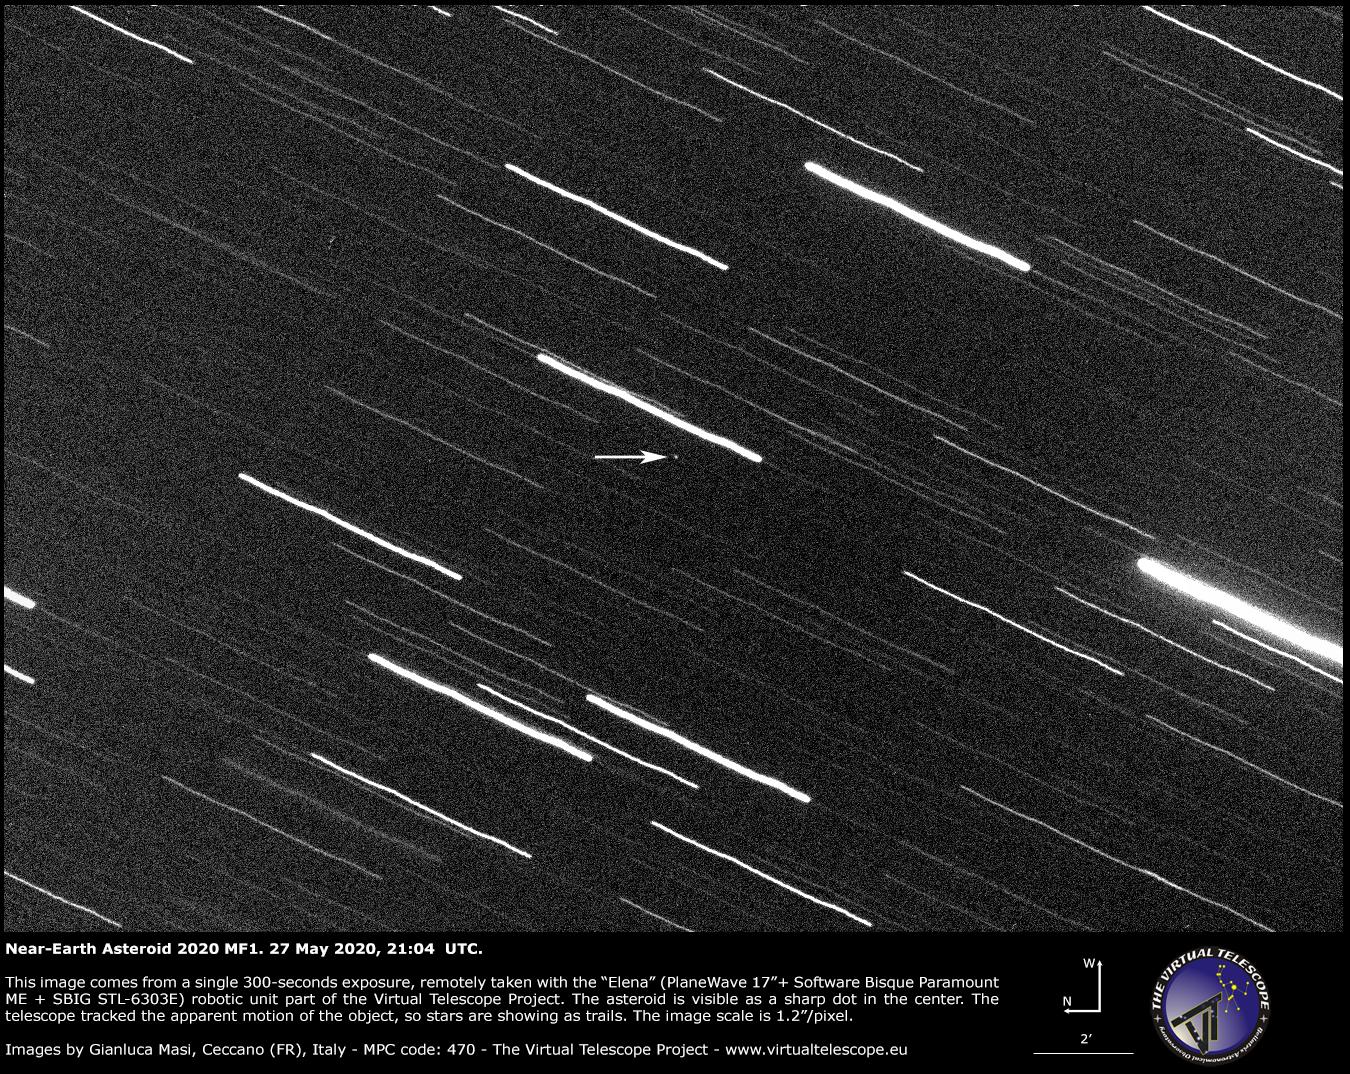 Near-Earth Asteroid 2020 MF1 - 26 June 2020.